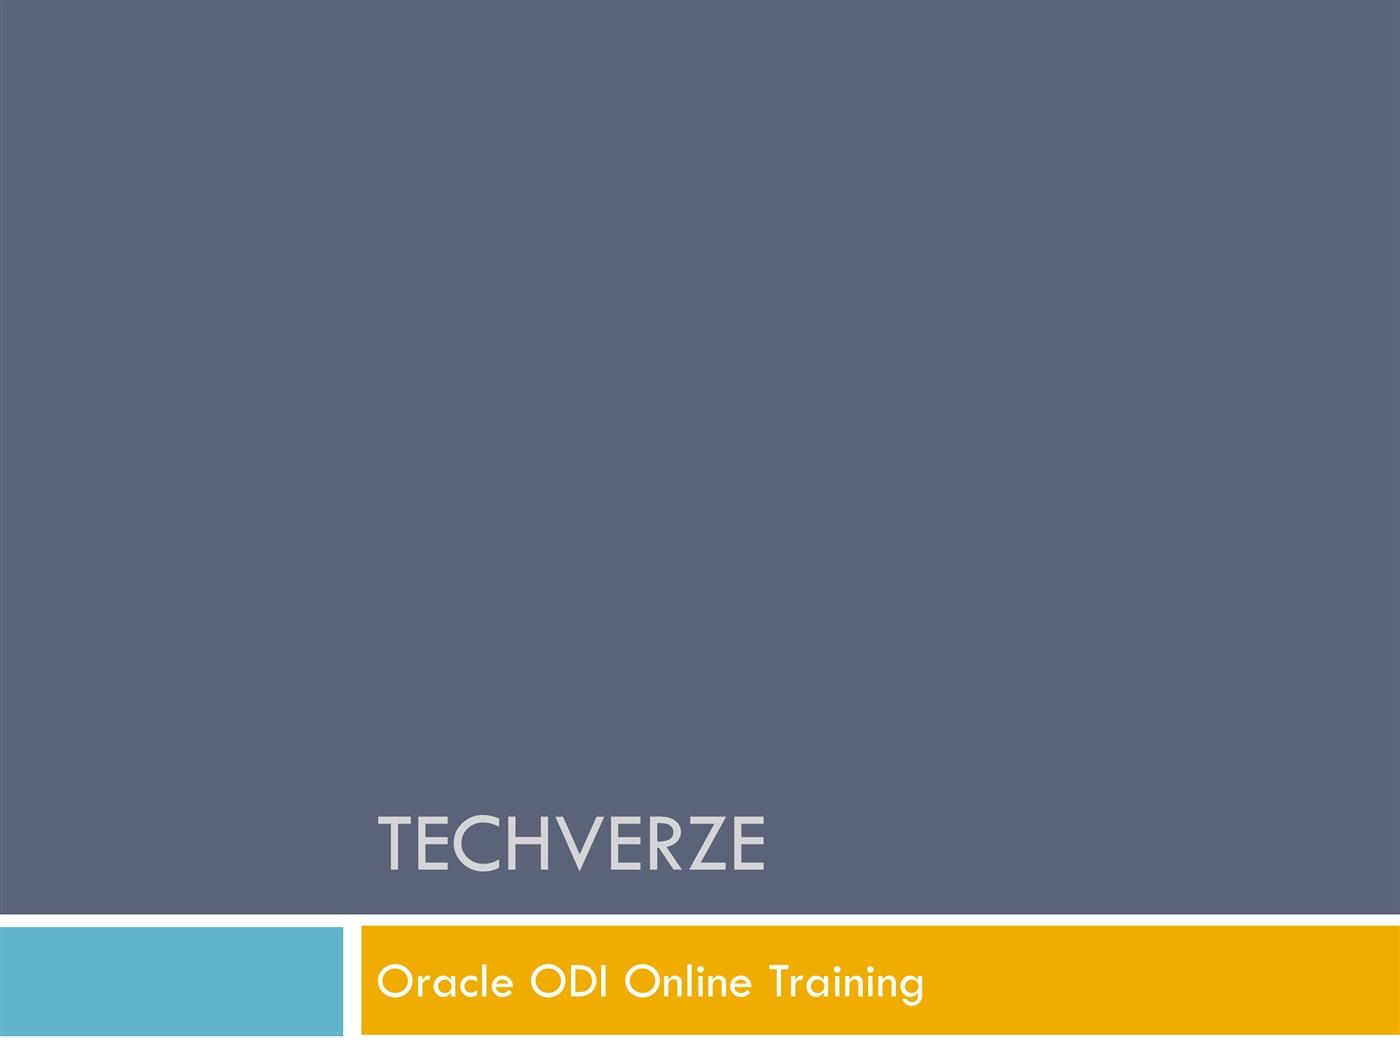 Oracle odi online trainingpptx powerpoint presentation ppt baditri Gallery